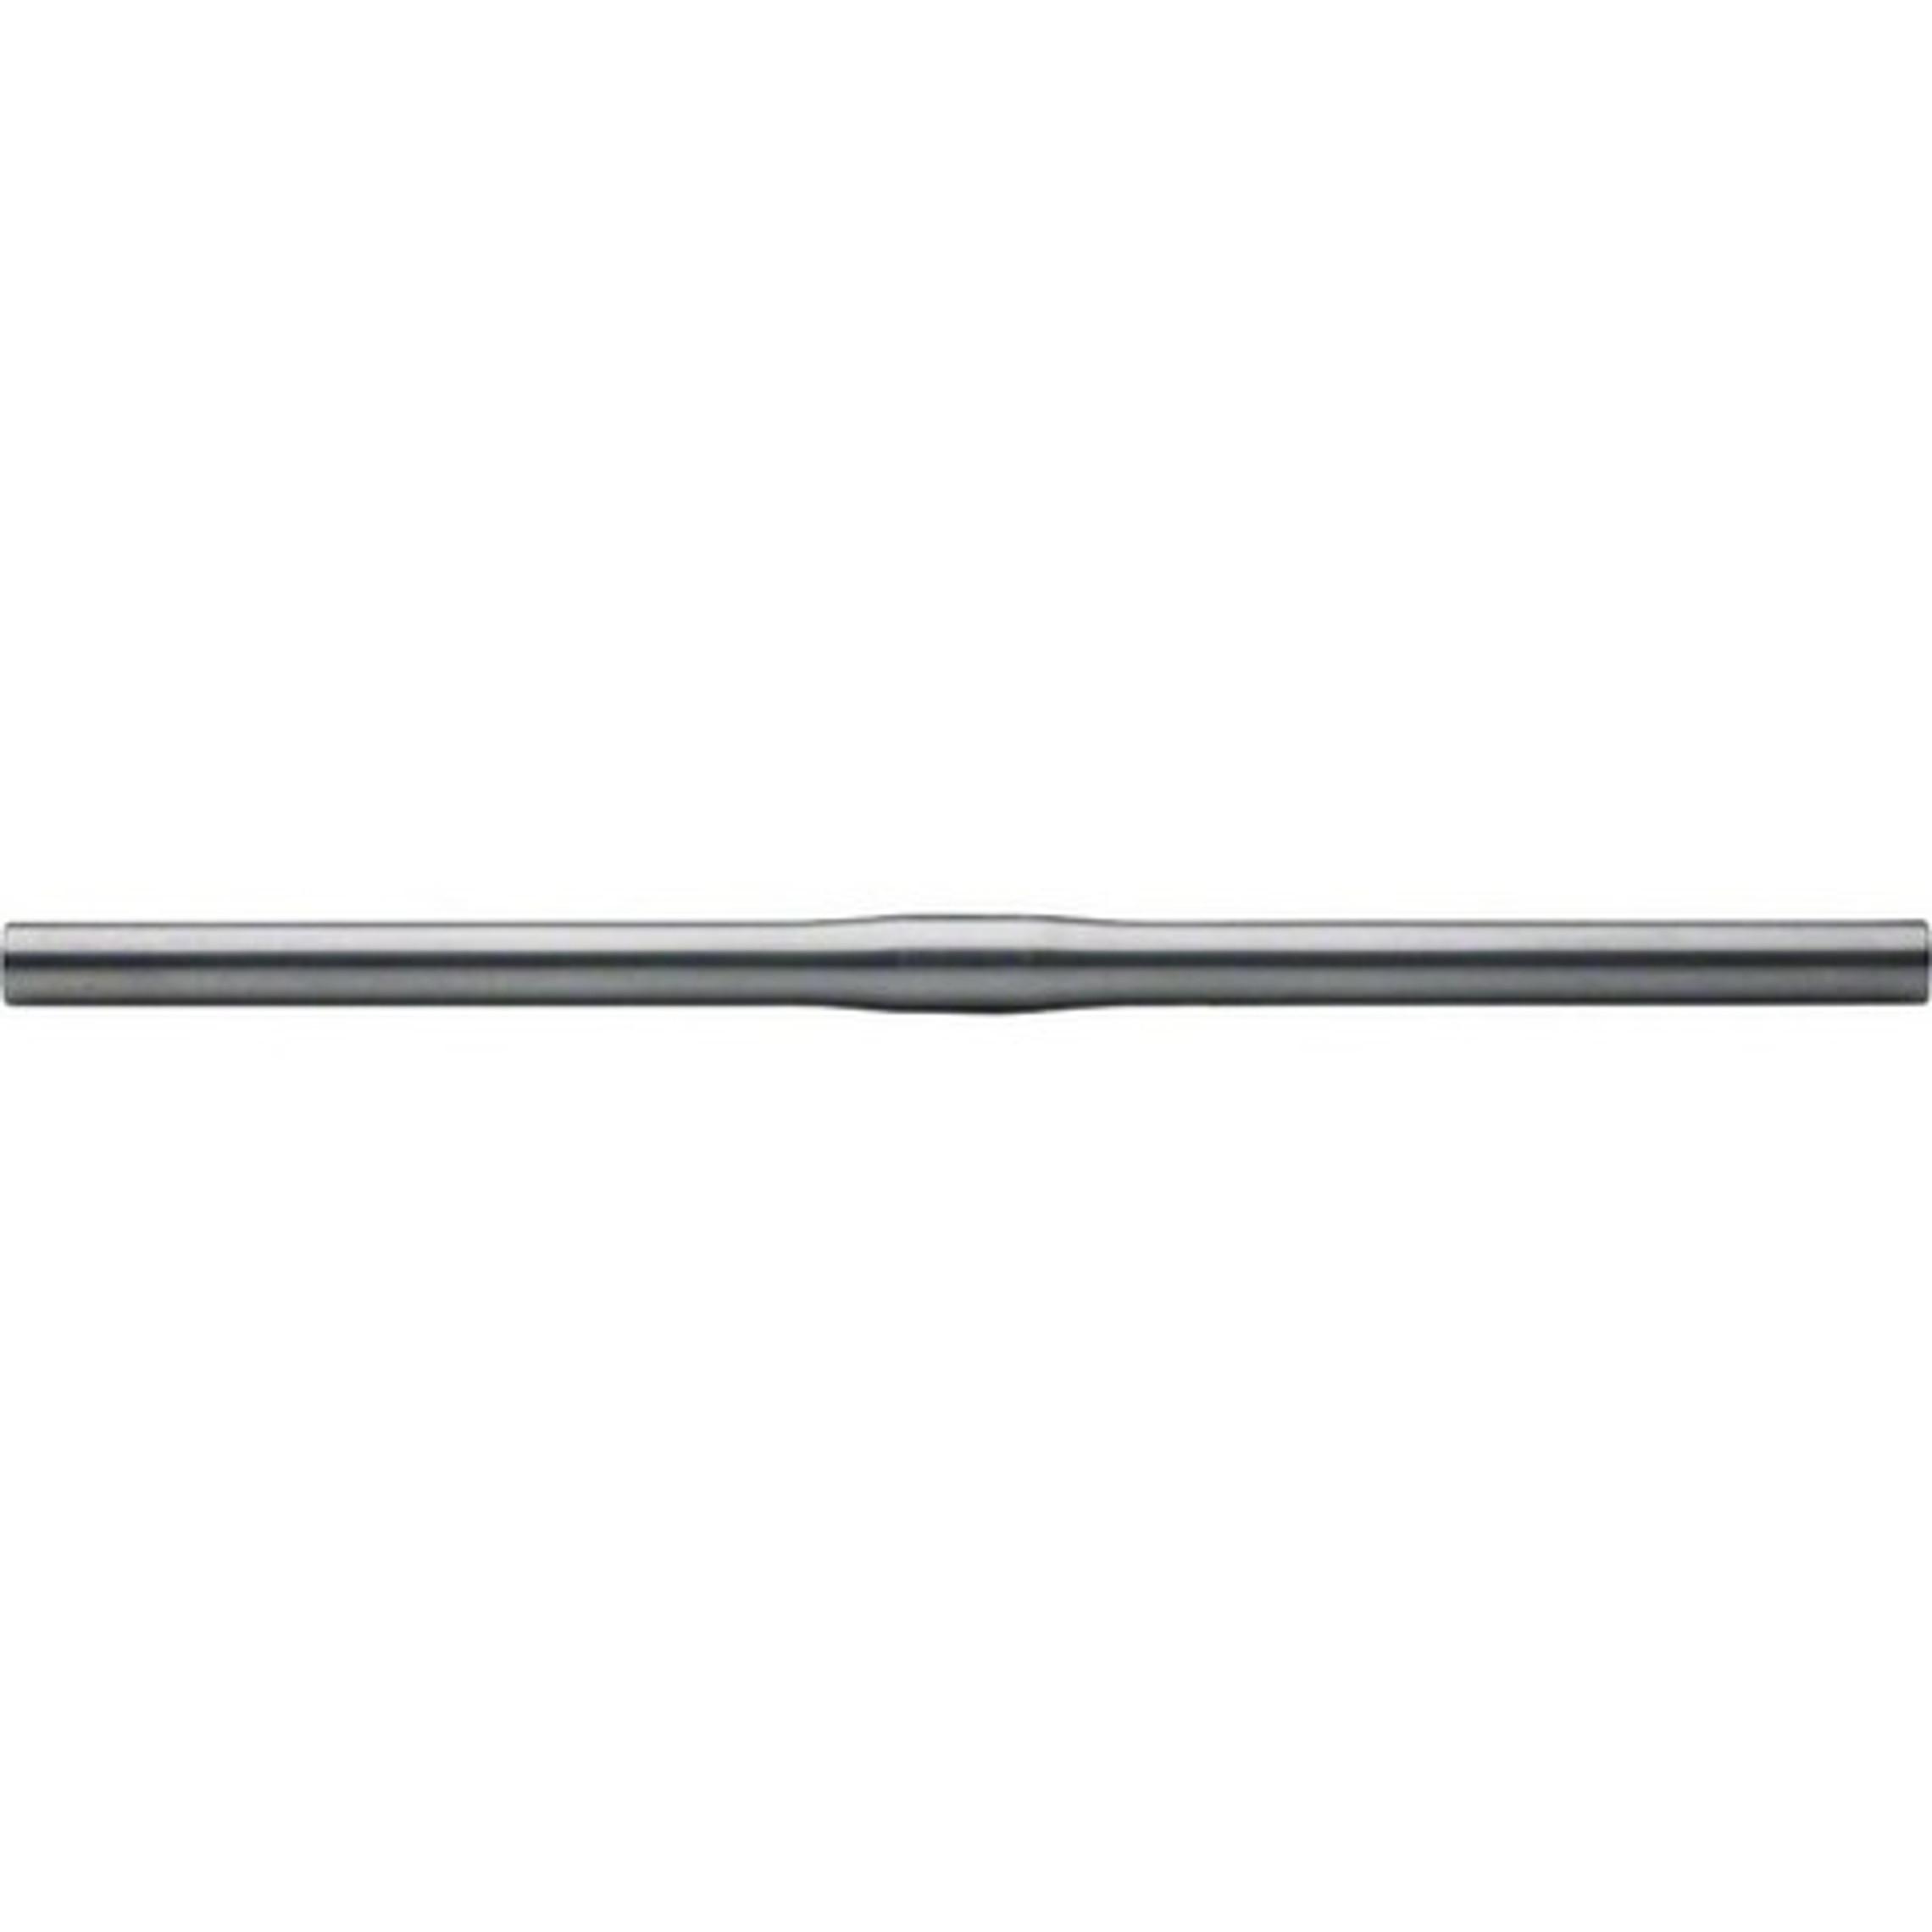 Nitto B2500 Straight Handlebar: 25.4mm Clamp x 500mm - Zero Rise/Sweep - Silver (NEW)